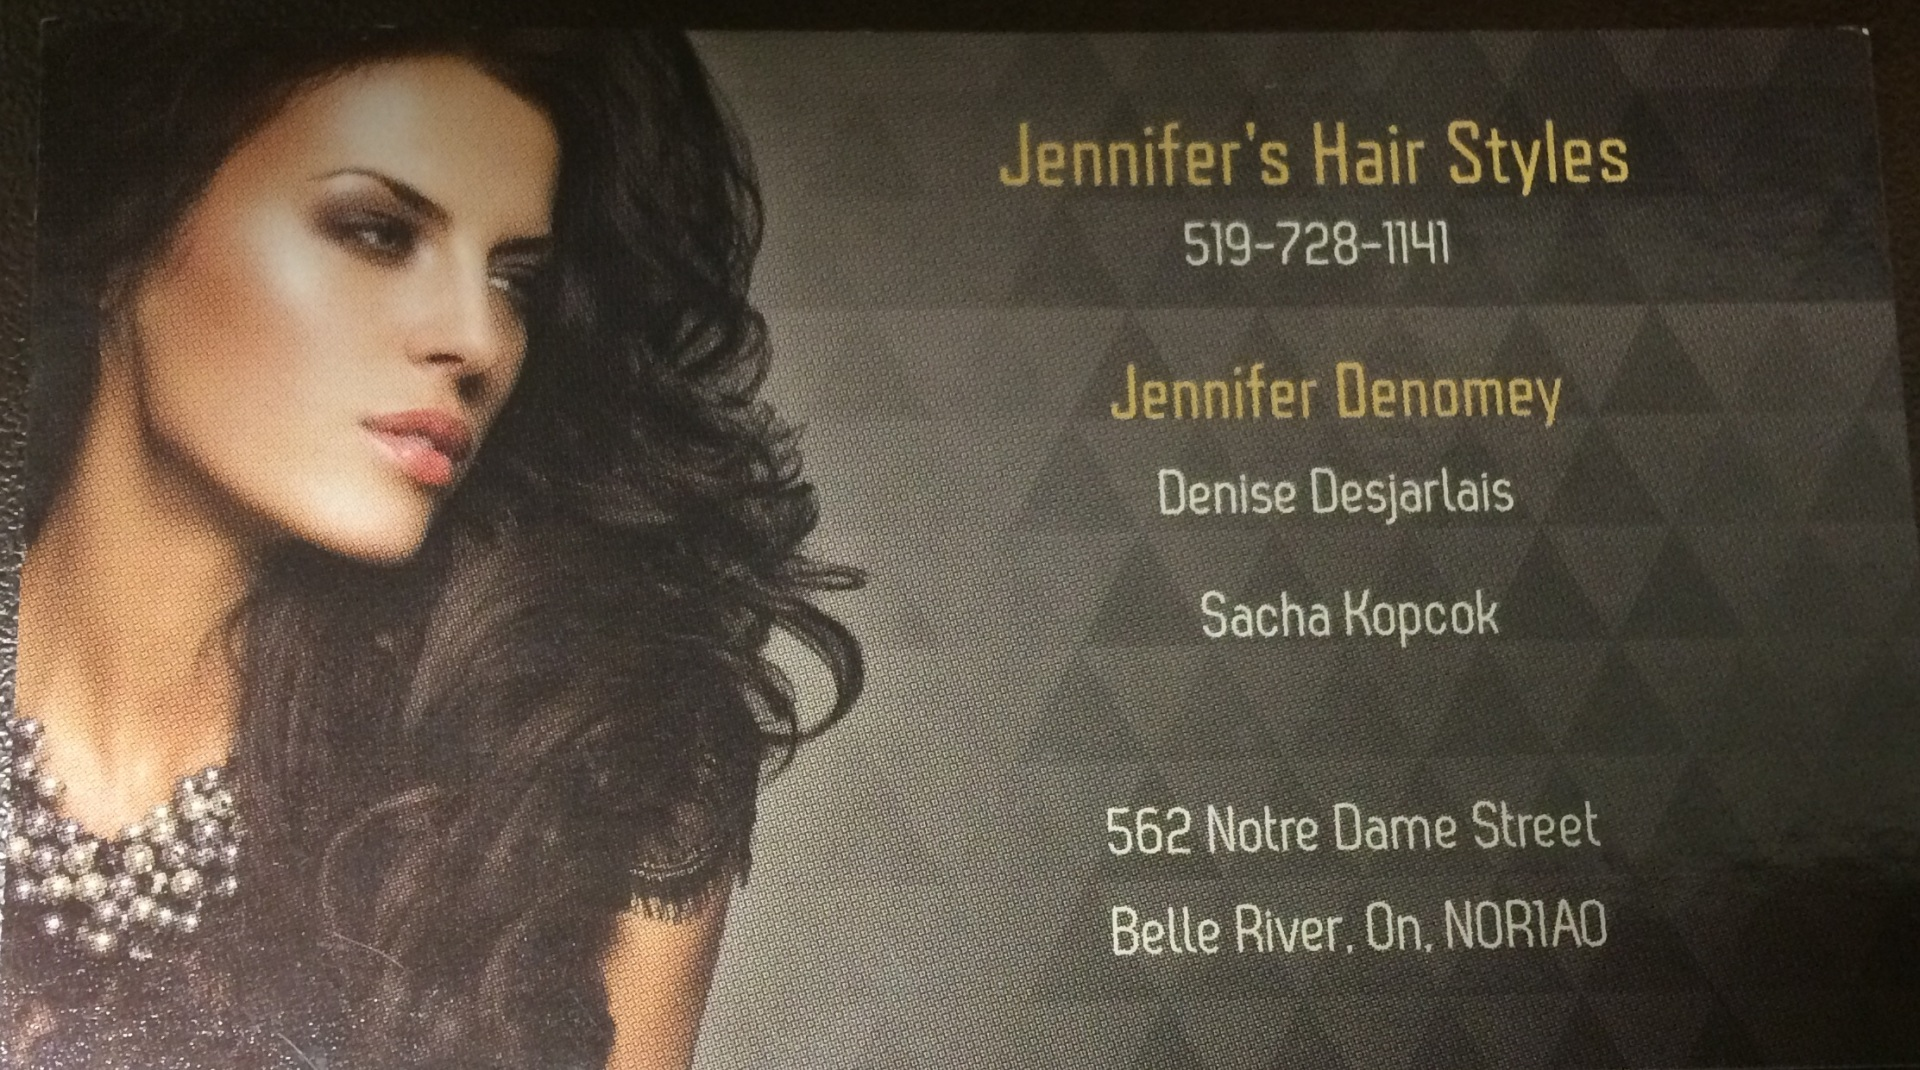 Jennifer's hair styles